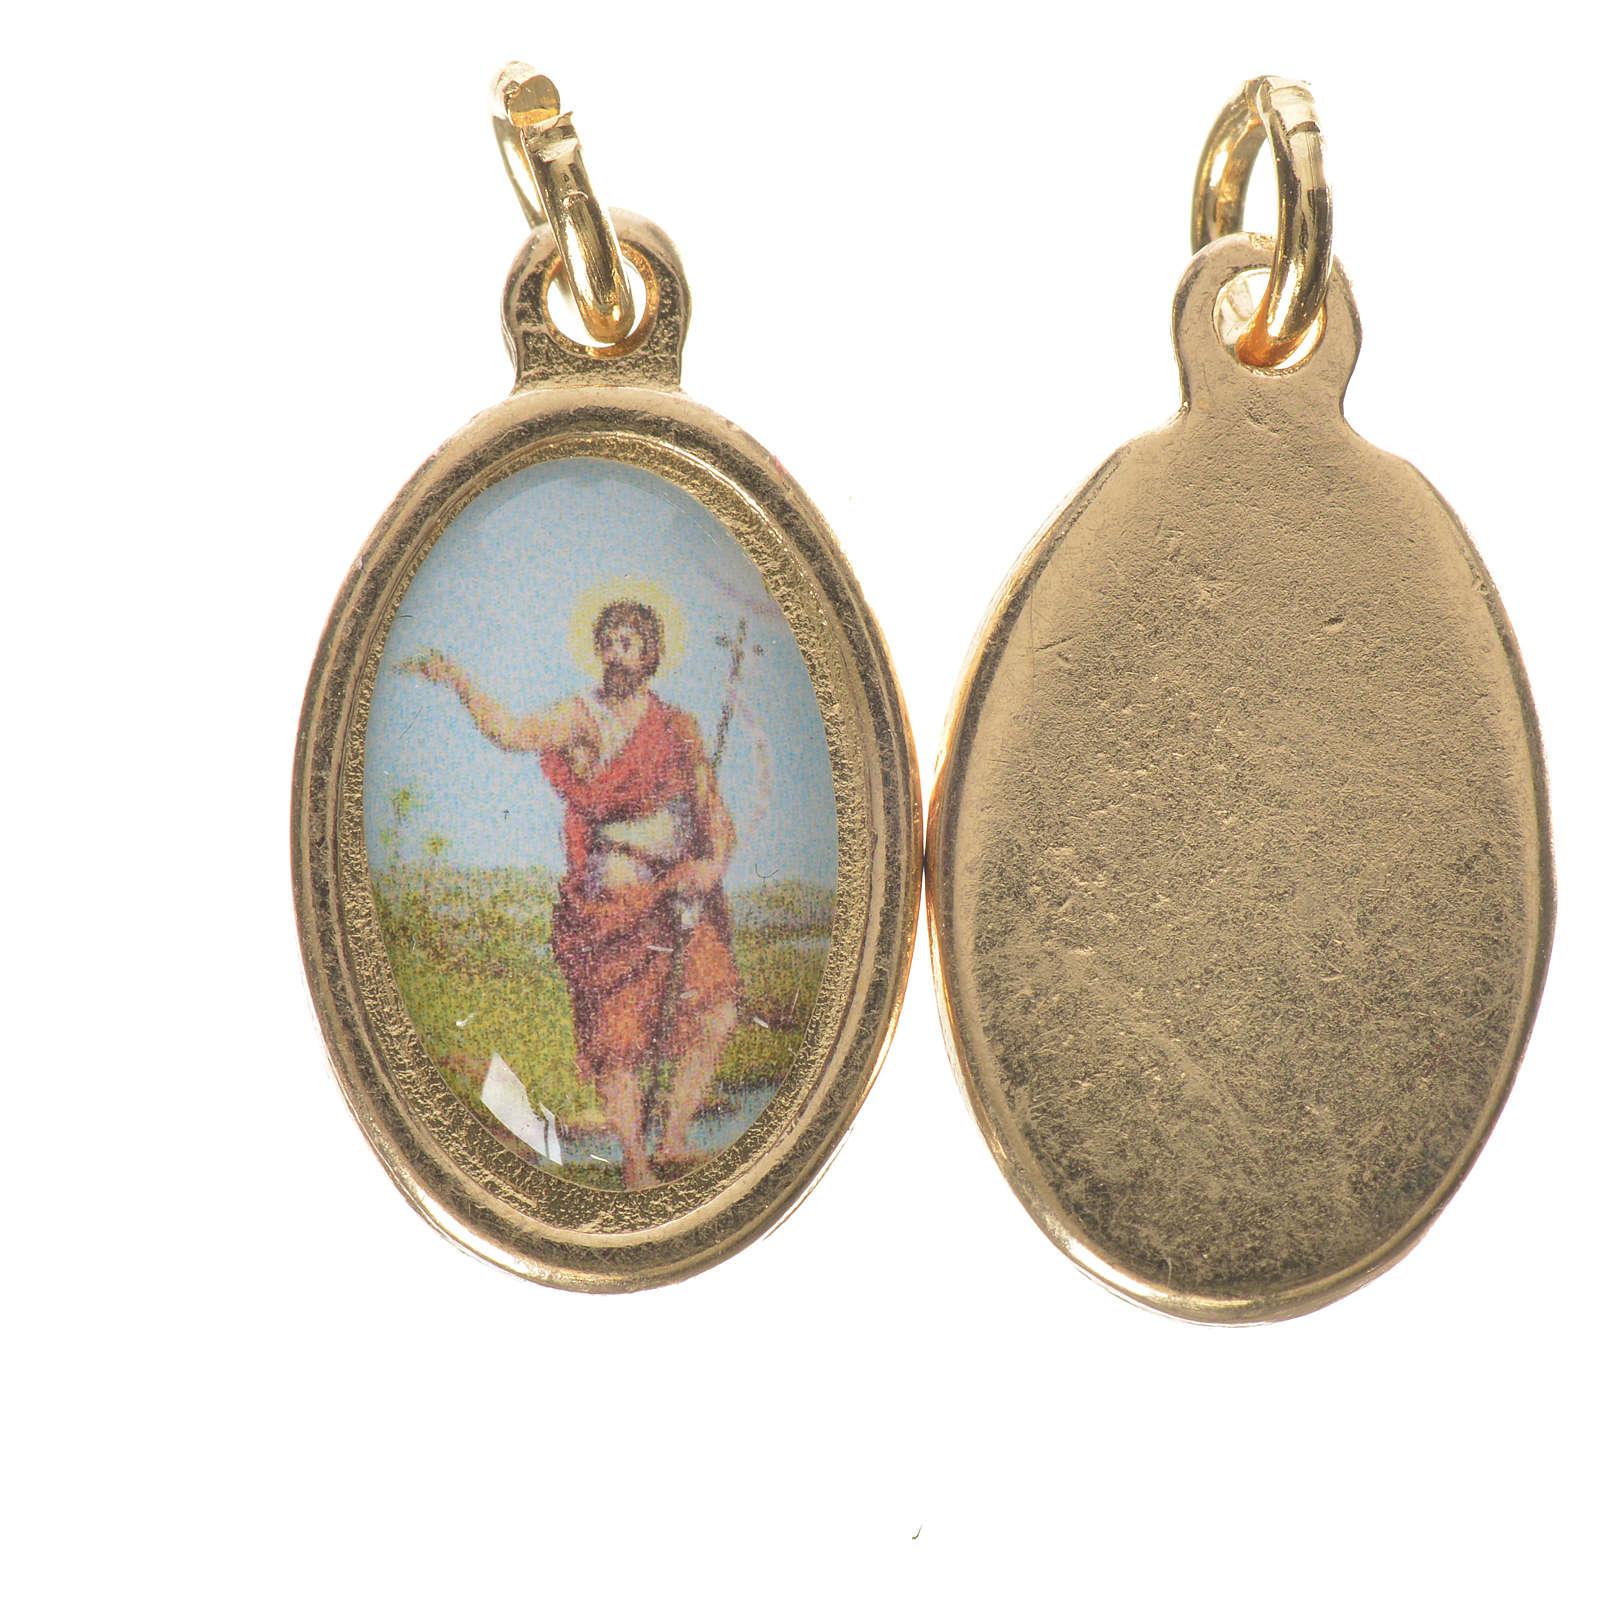 Medalla S. Juan Bautista metal dorado altura 1,5 cm 4